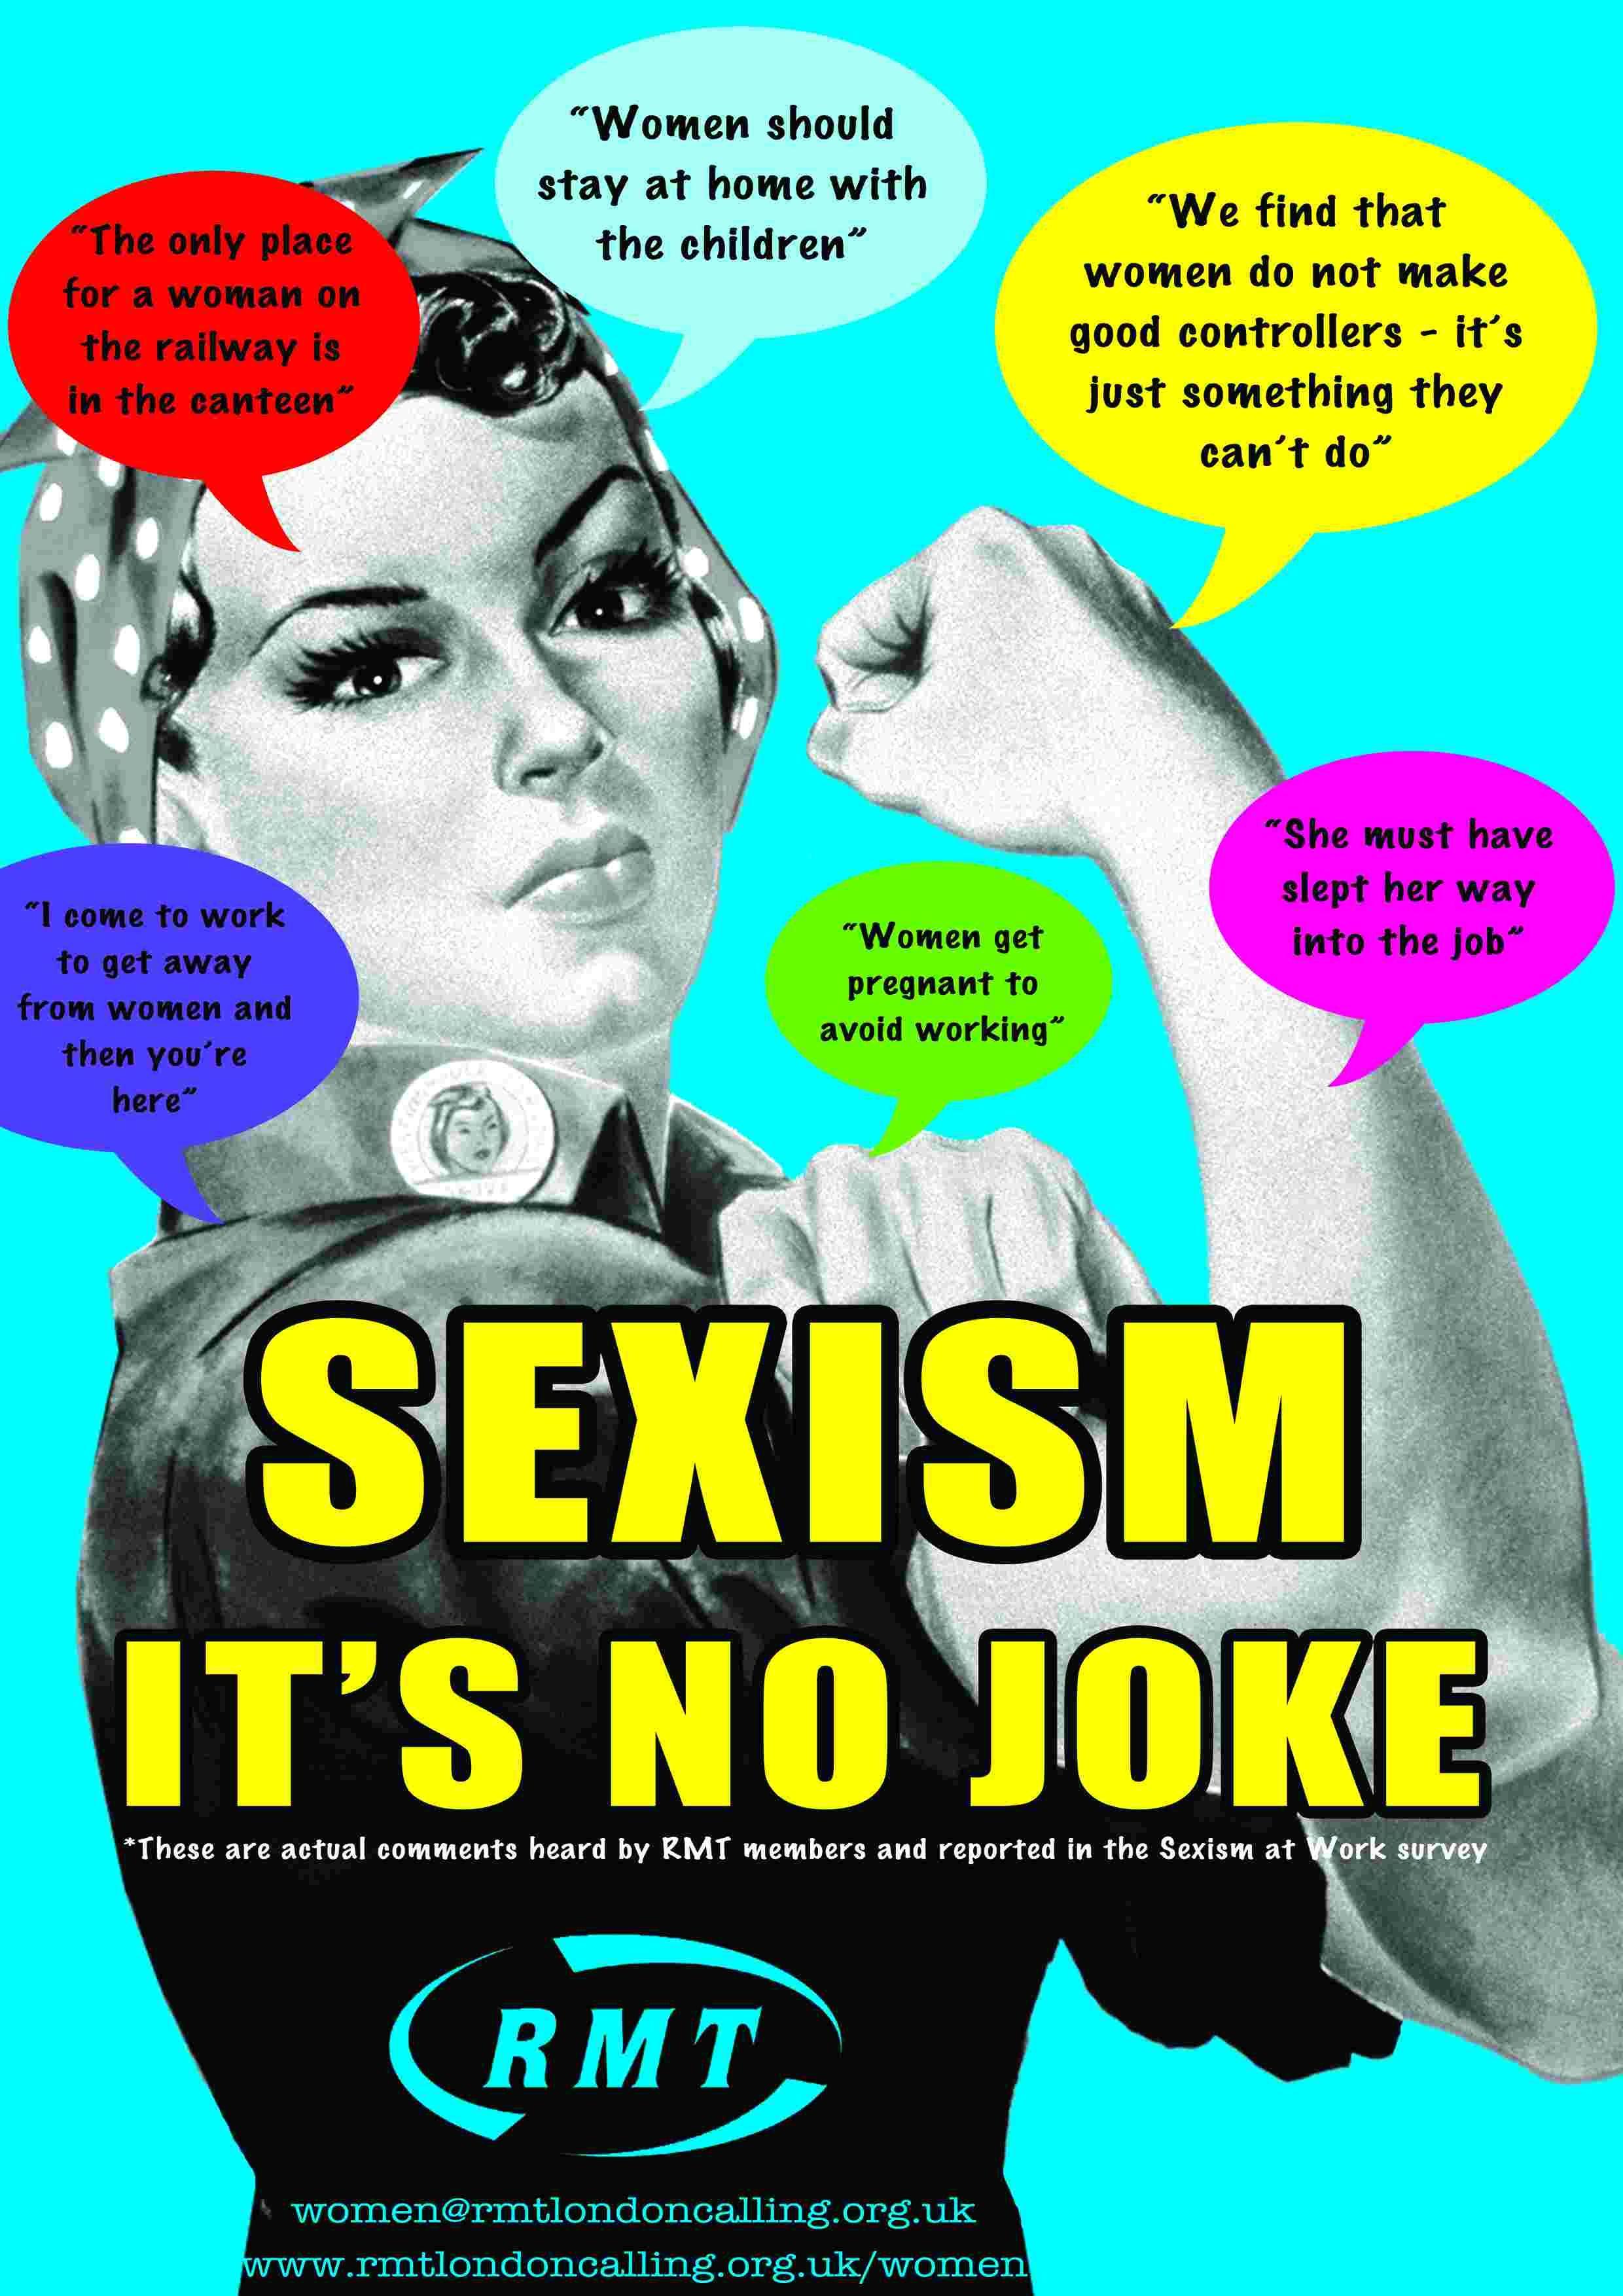 bang-fuck-sexist-women-jokes-jay-sexy